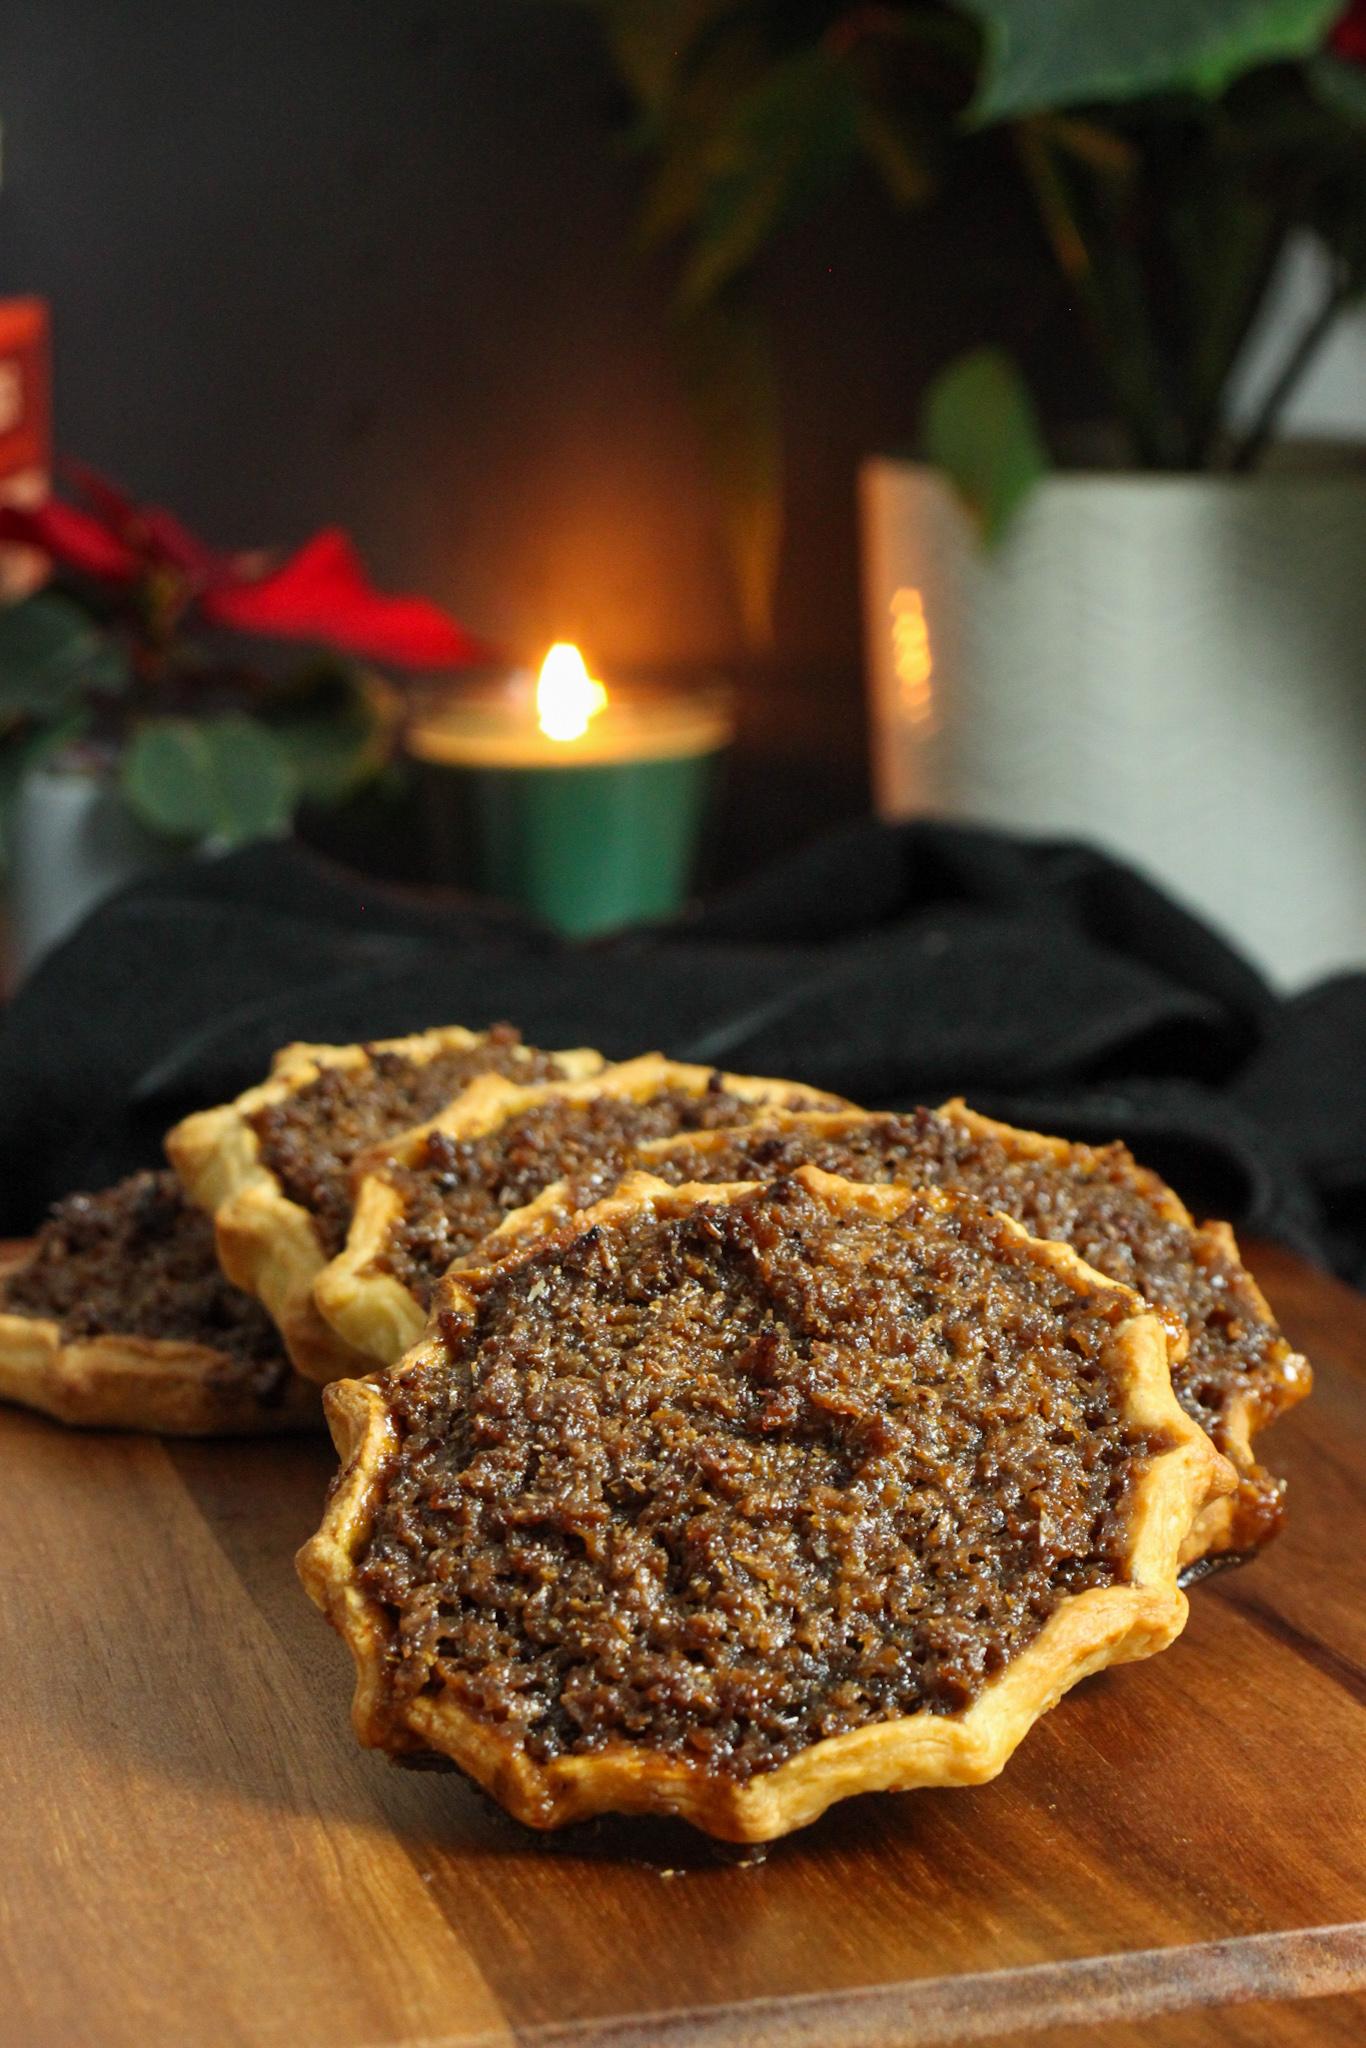 Caribbean Sweets: Gizzada Tart